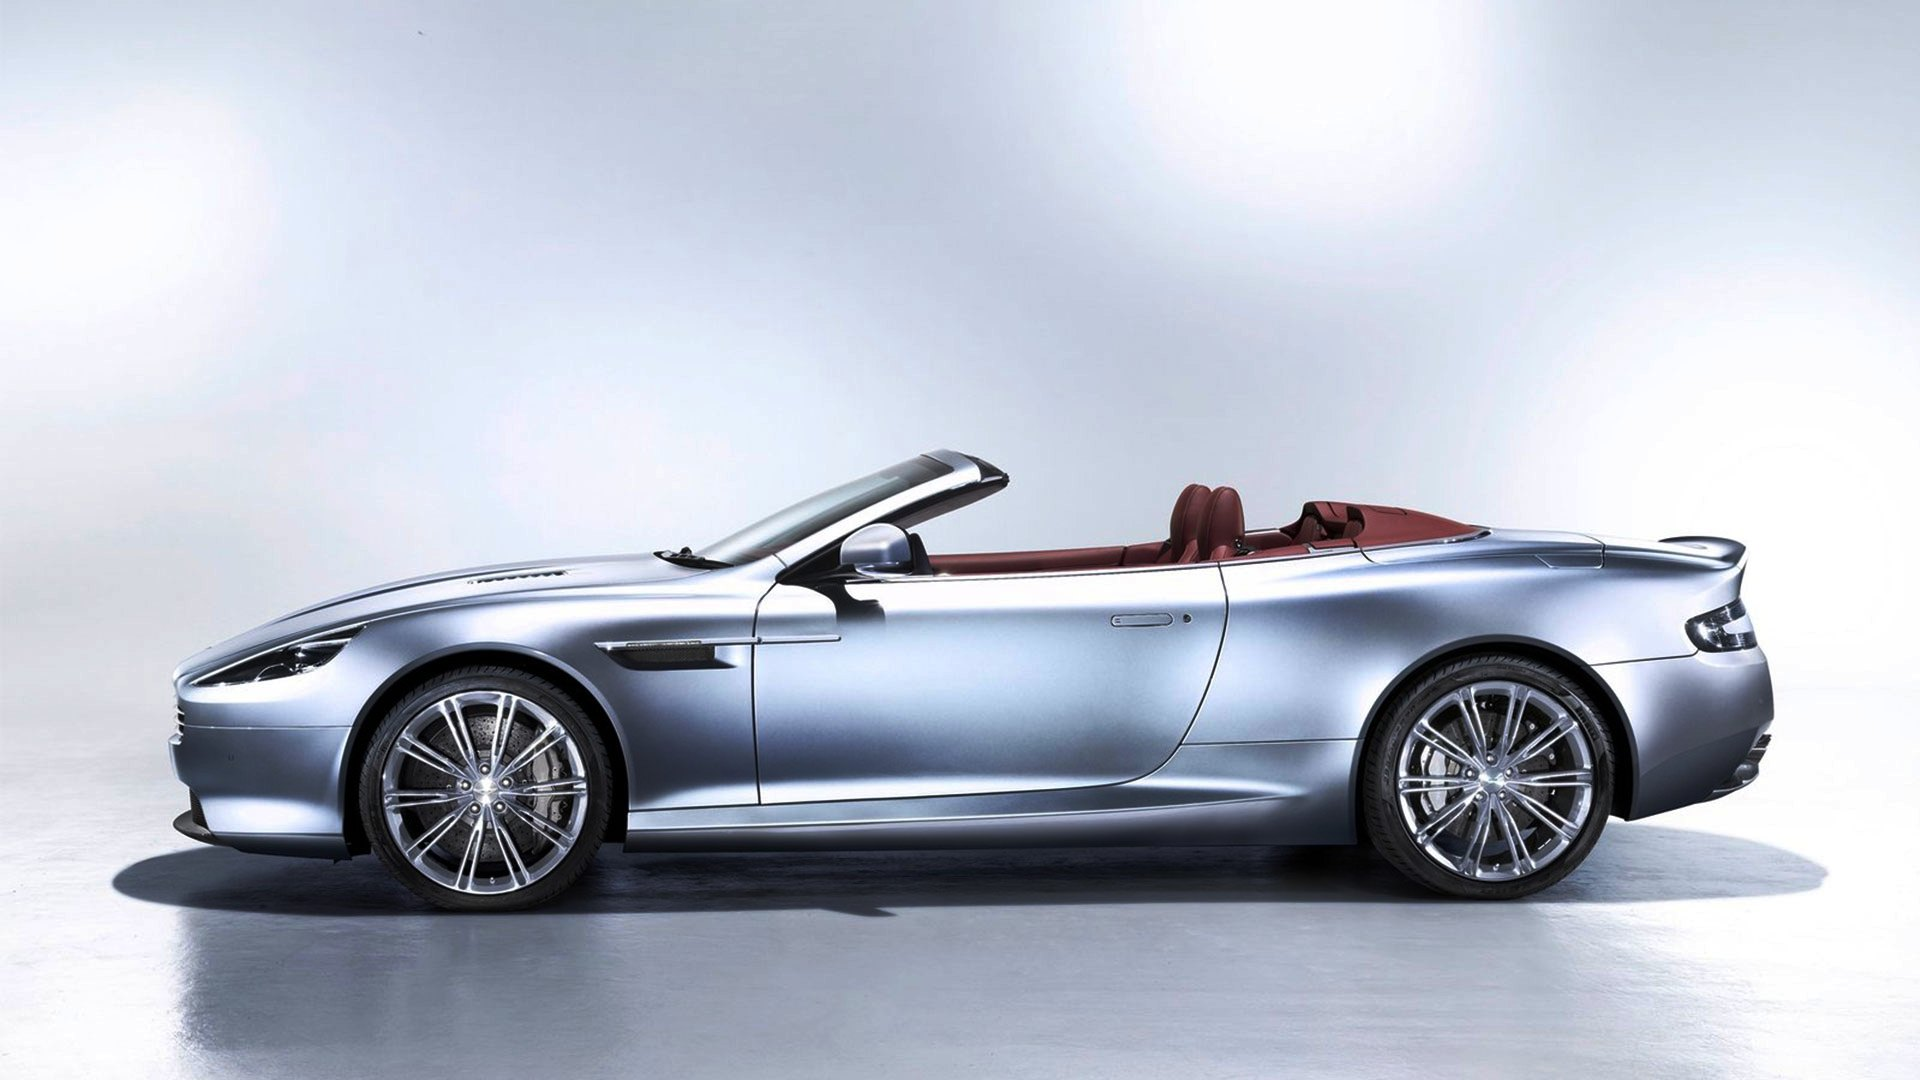 Exterior 2013 Aston Martin DB9 HD Wallpaper